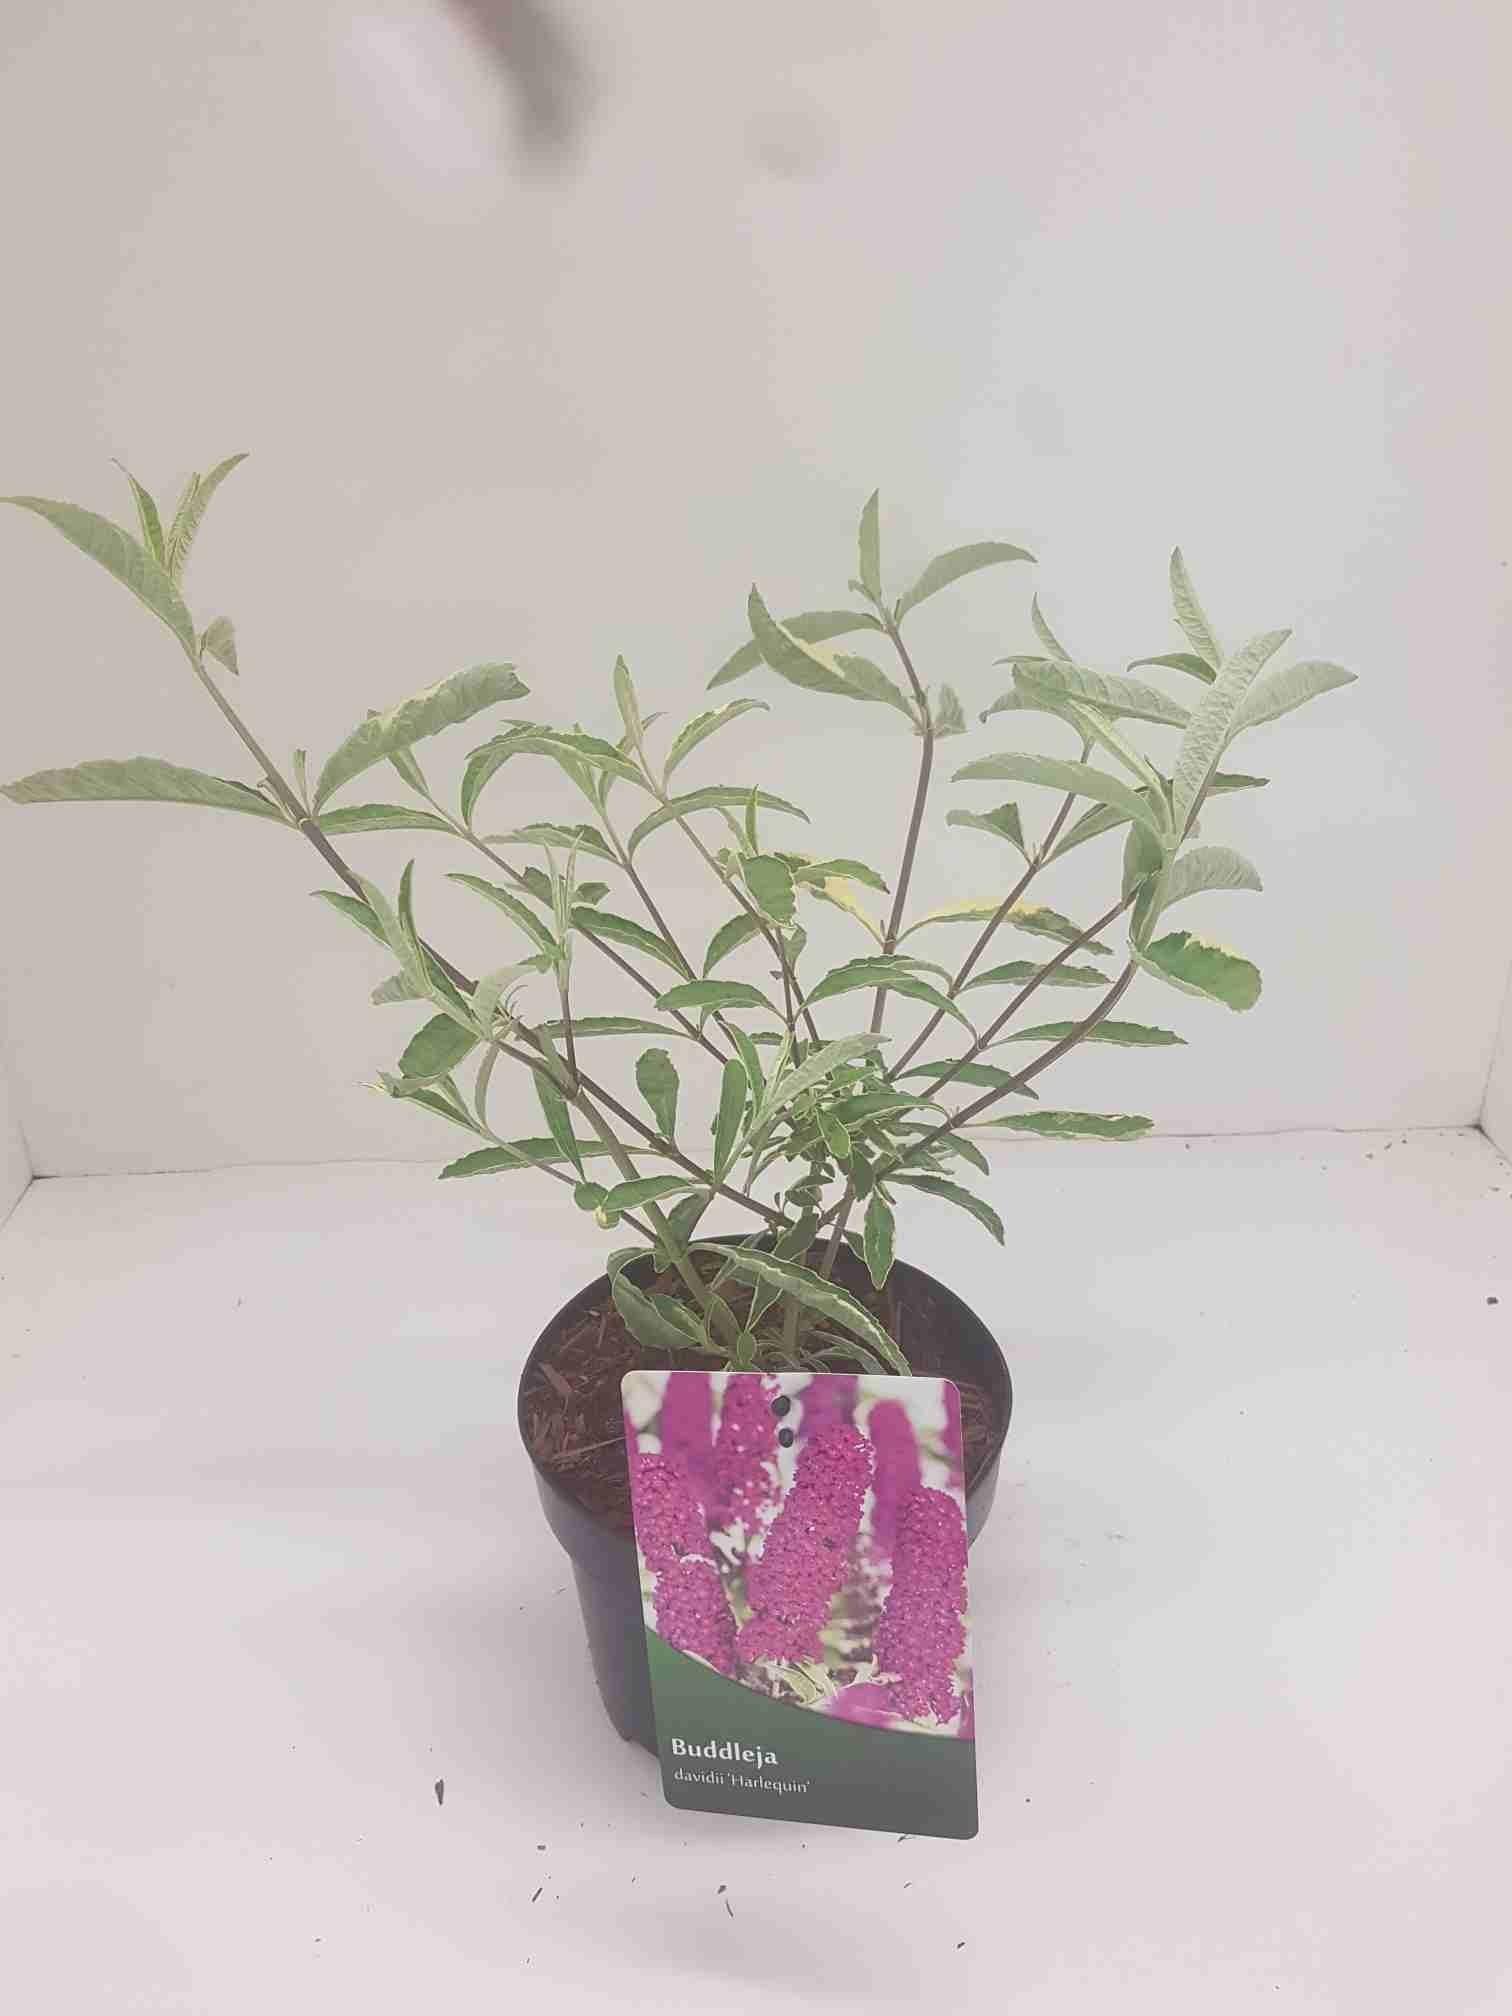 Vlinderstruik (Buddleja davidii 'Harlequin')-Plant in pot-40/60 cm. Kleur: paars